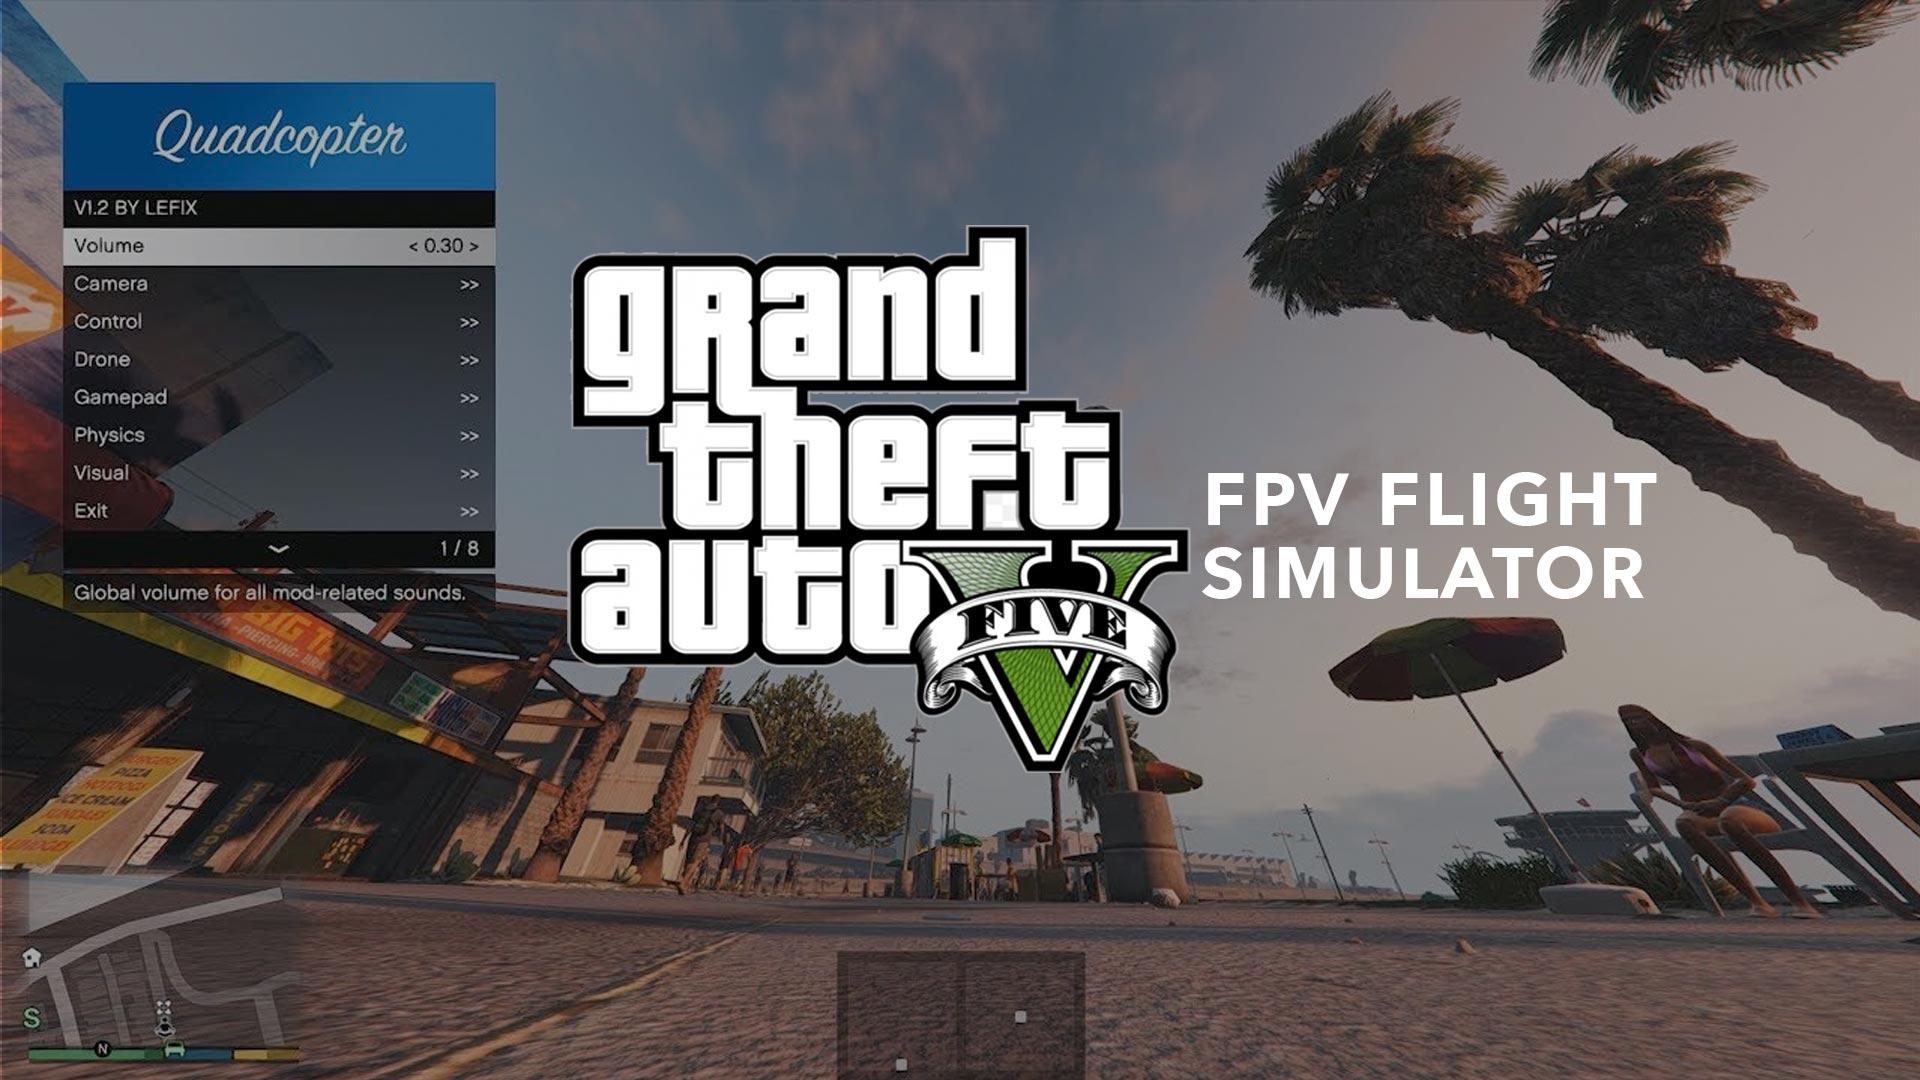 Gta V Fpv Flight Simulator The Closest Thing To Real Life Dronedj